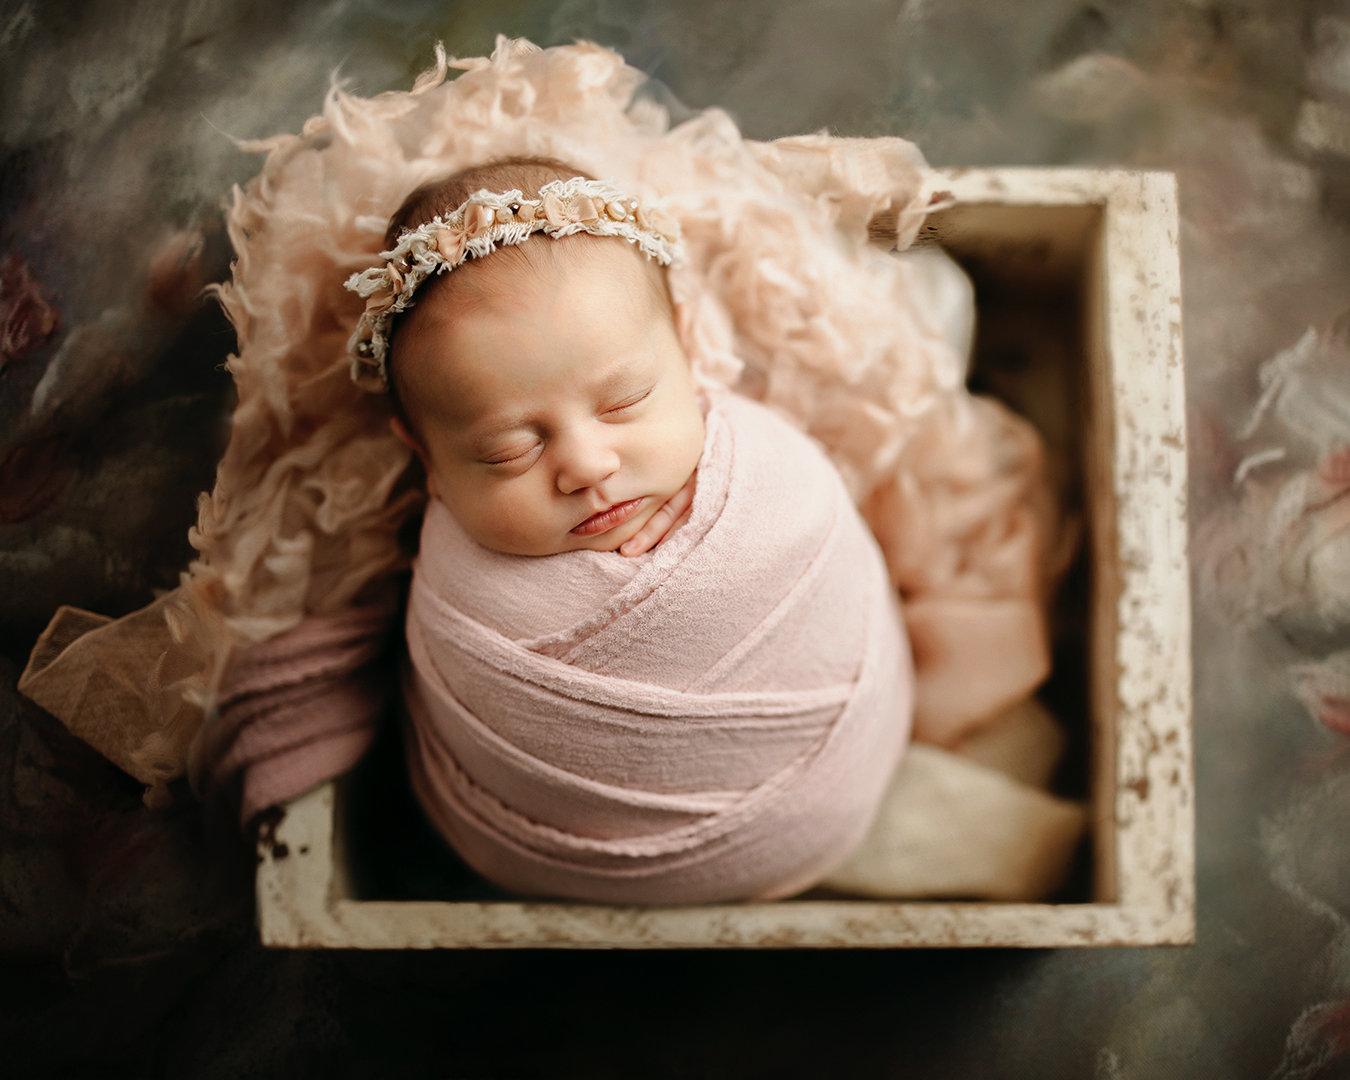 The Complete Newborn Session